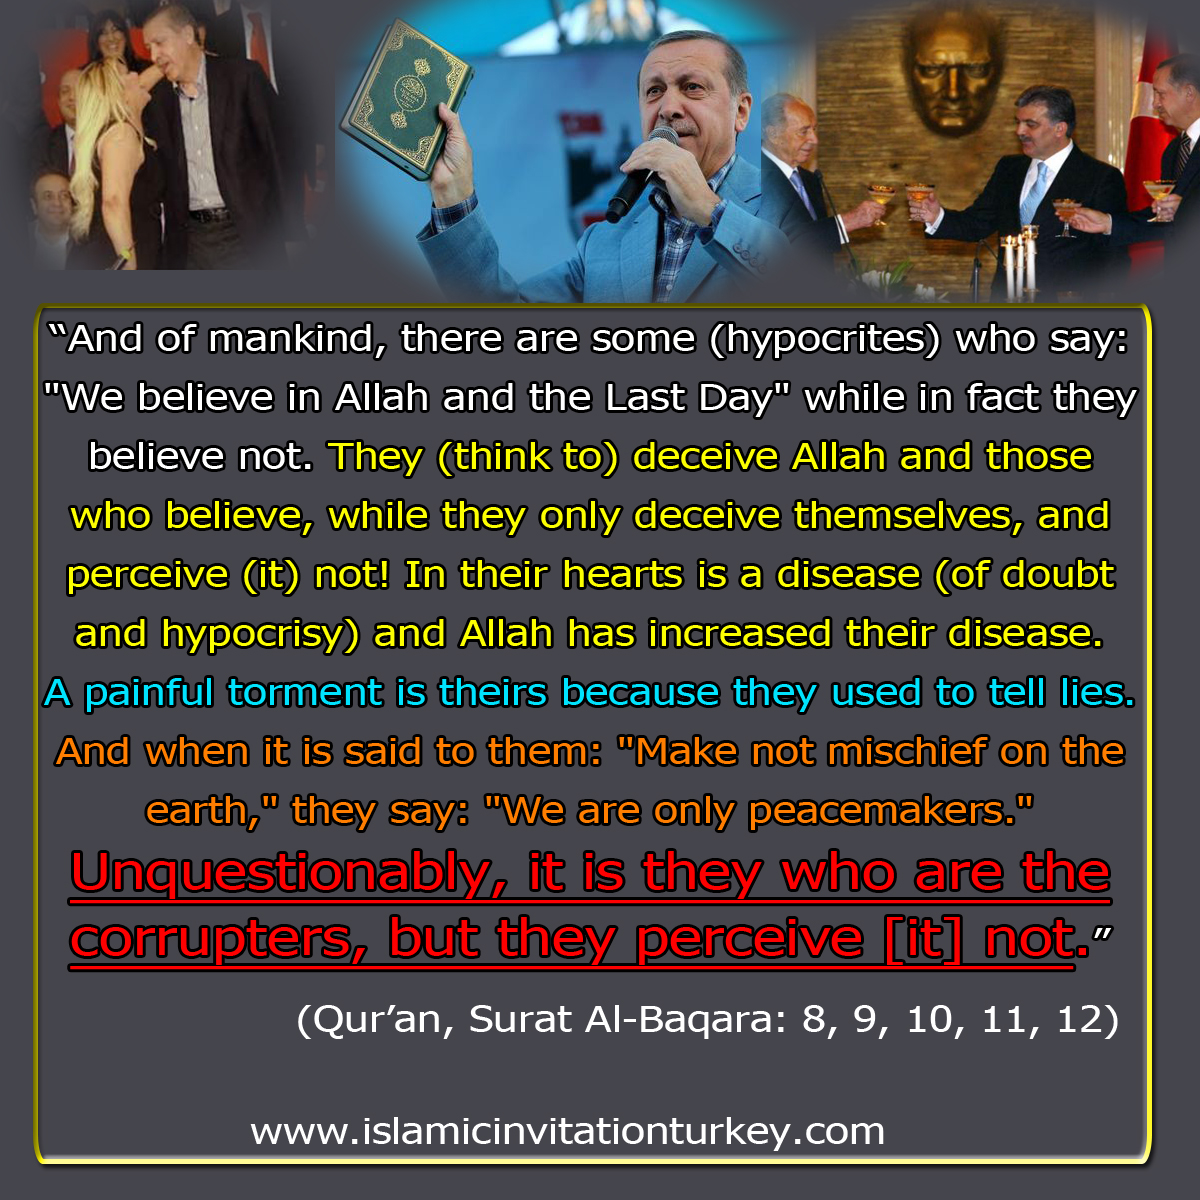 hypocrites in Qur'an